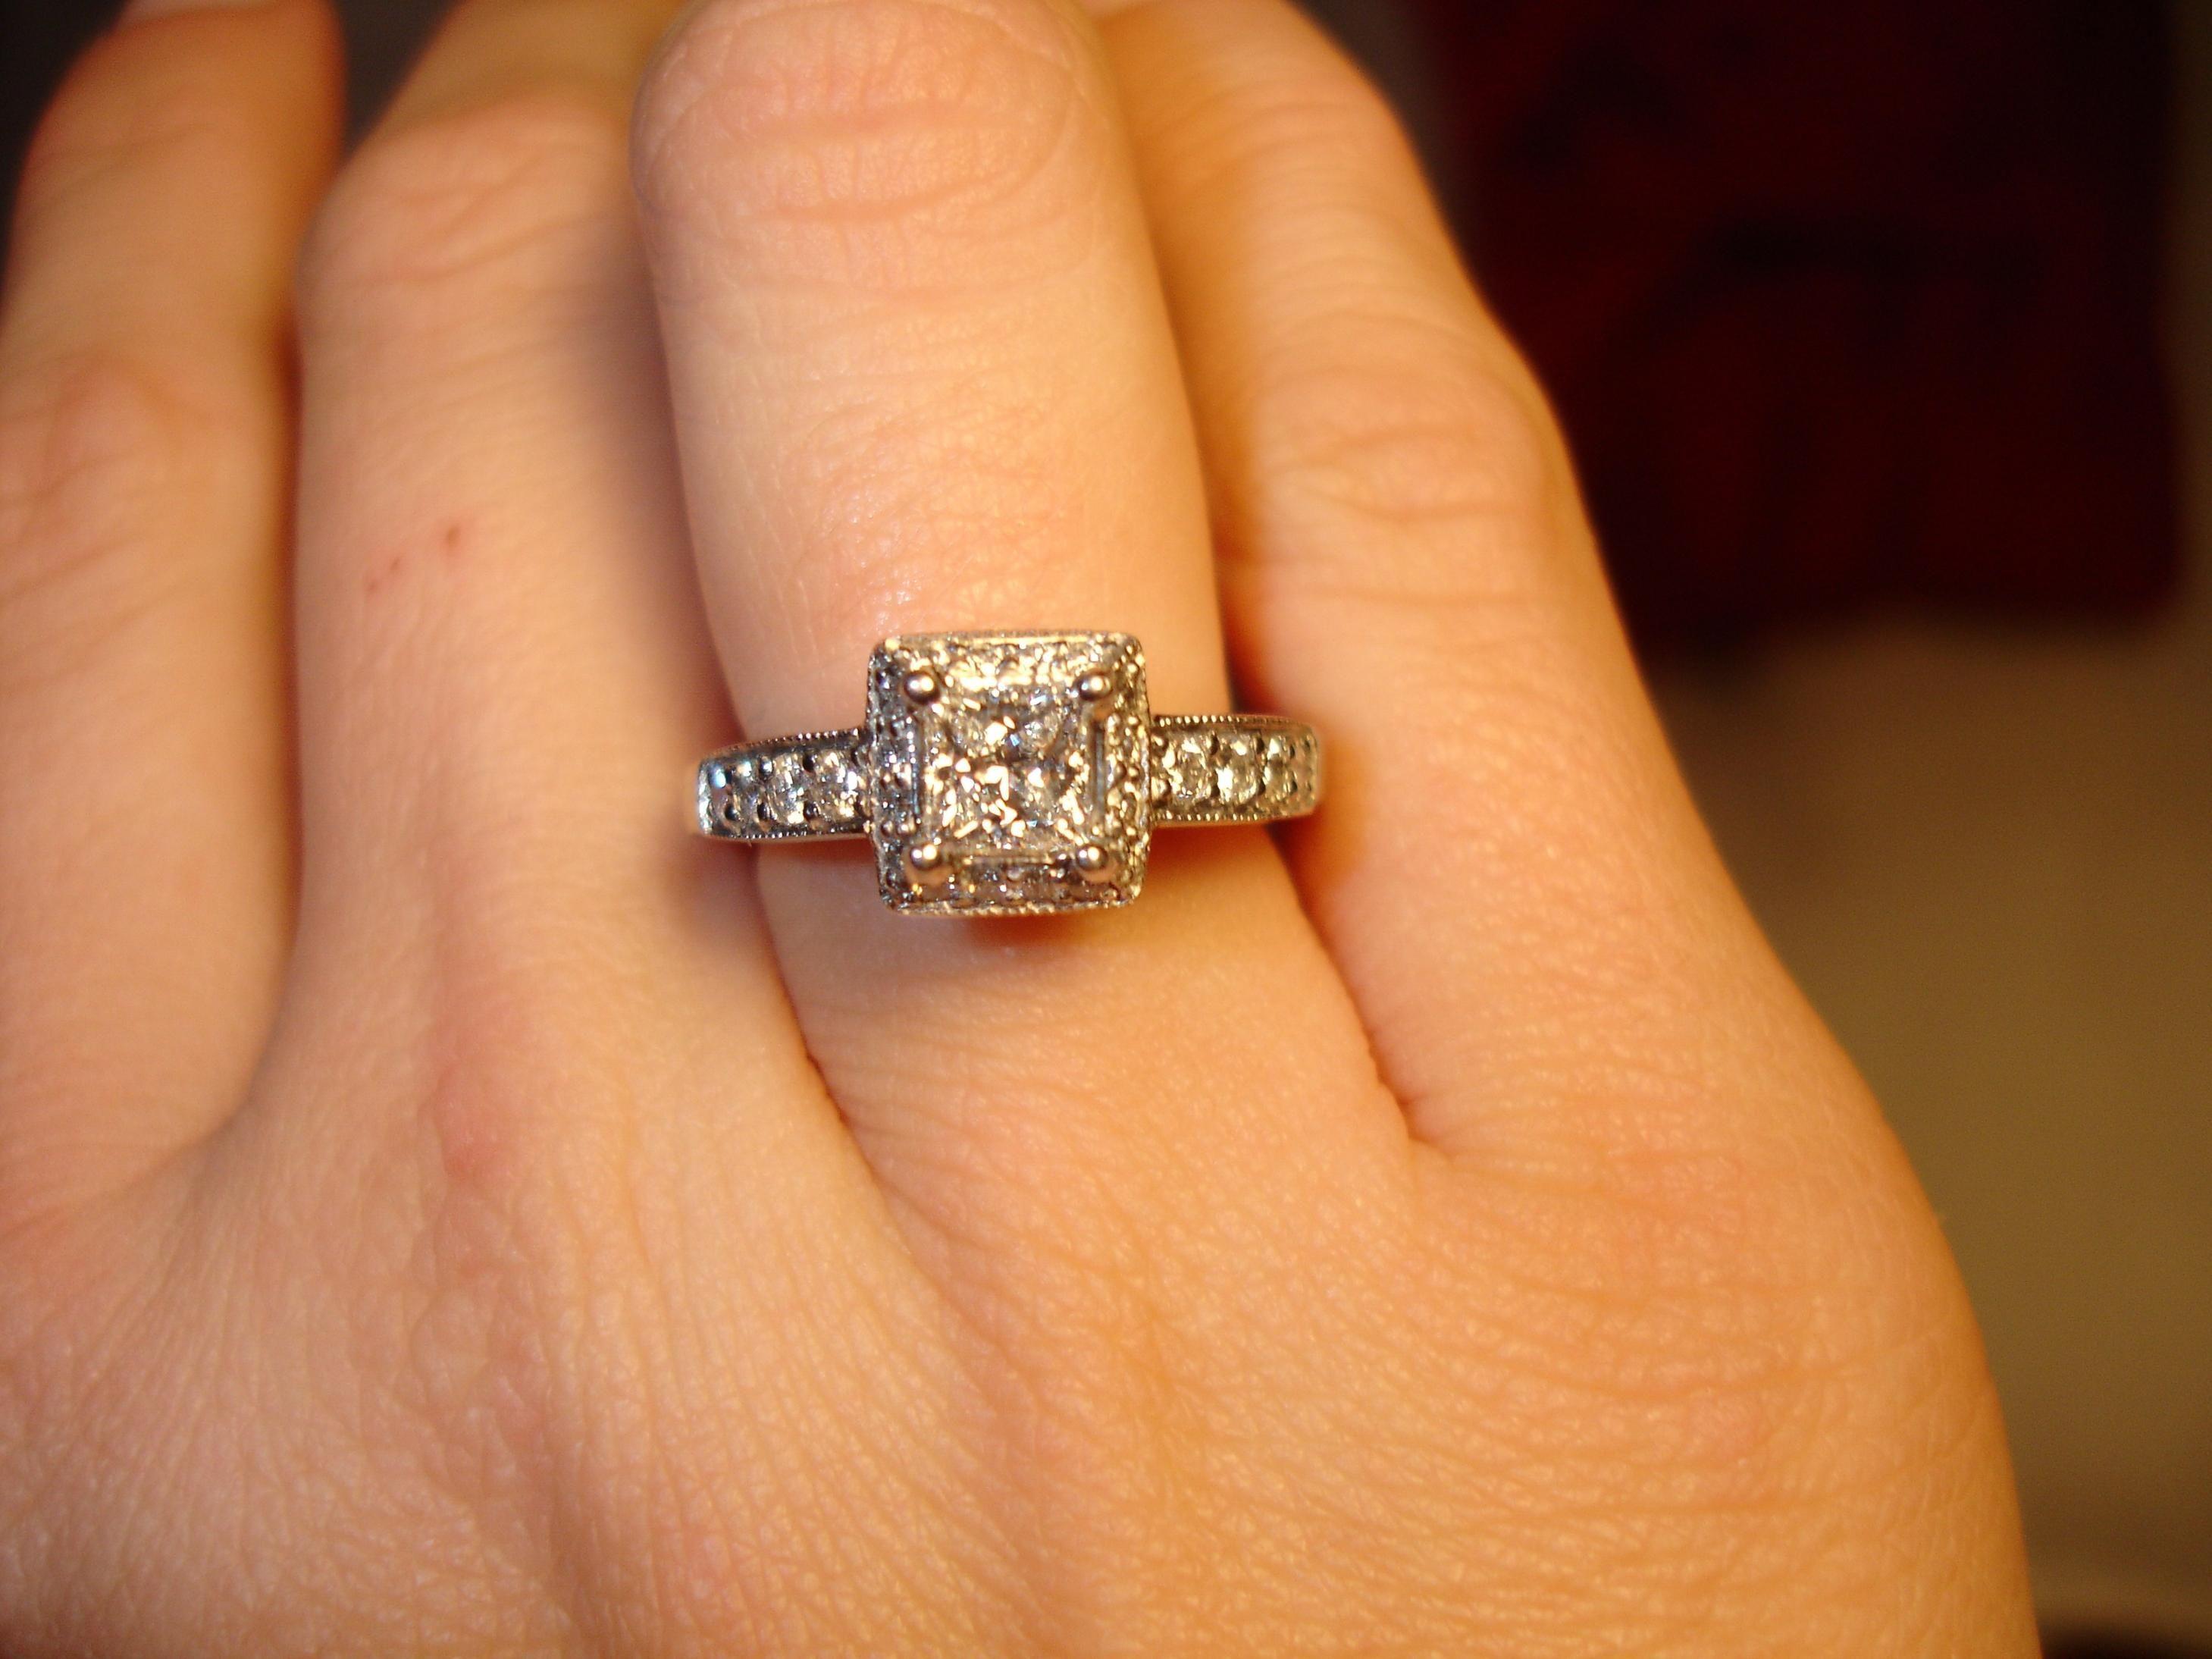 huge diamond engagement rings hand models 23 engagement